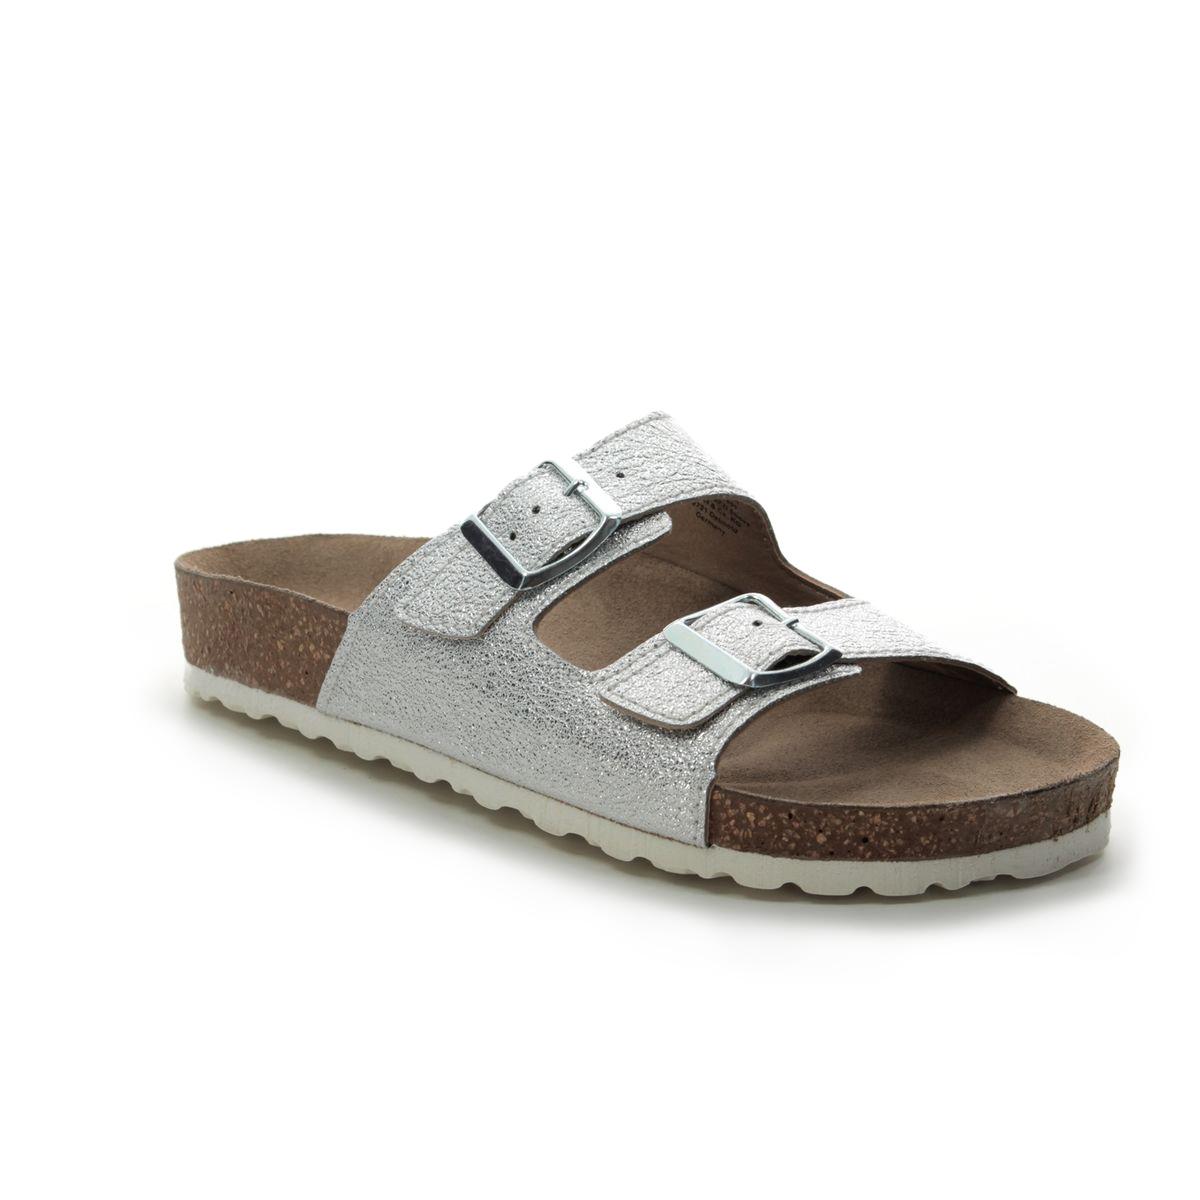 b312bb560 Marco Tozzi Slide Sandals - Silver - 27401 22 941 FRANCA SLIDE